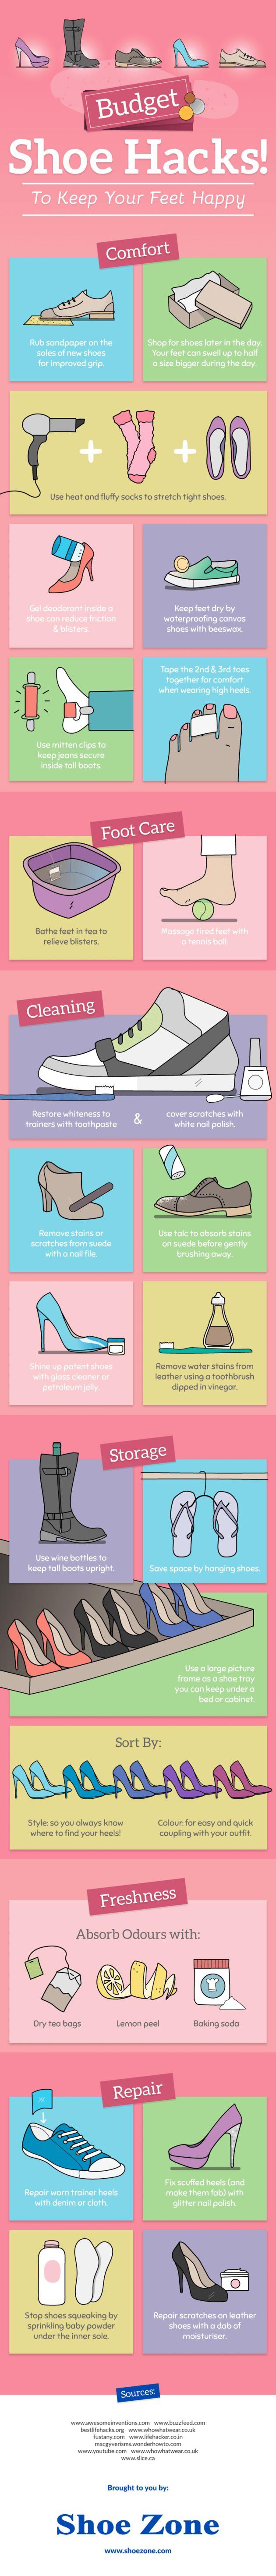 These Shoe Hacks Will Make Your Footwear Last Longer